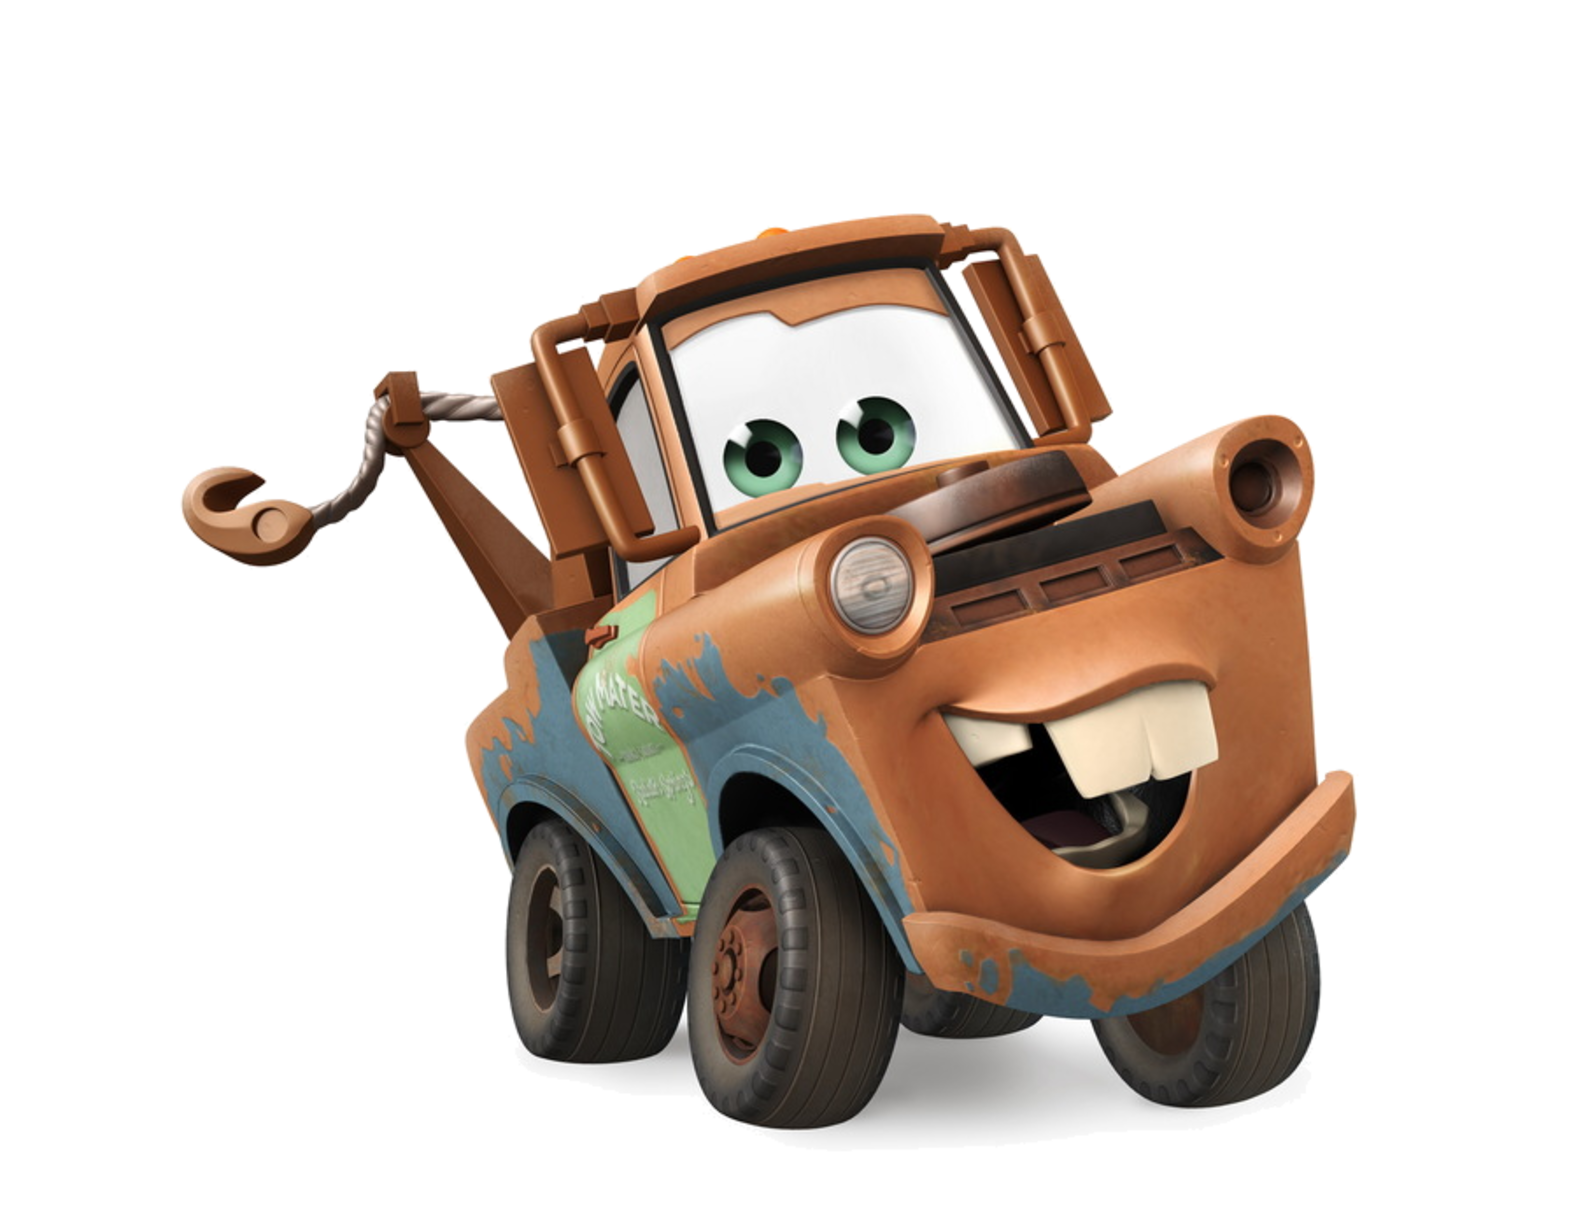 PNG Transparent Tow Mater.PNG Images